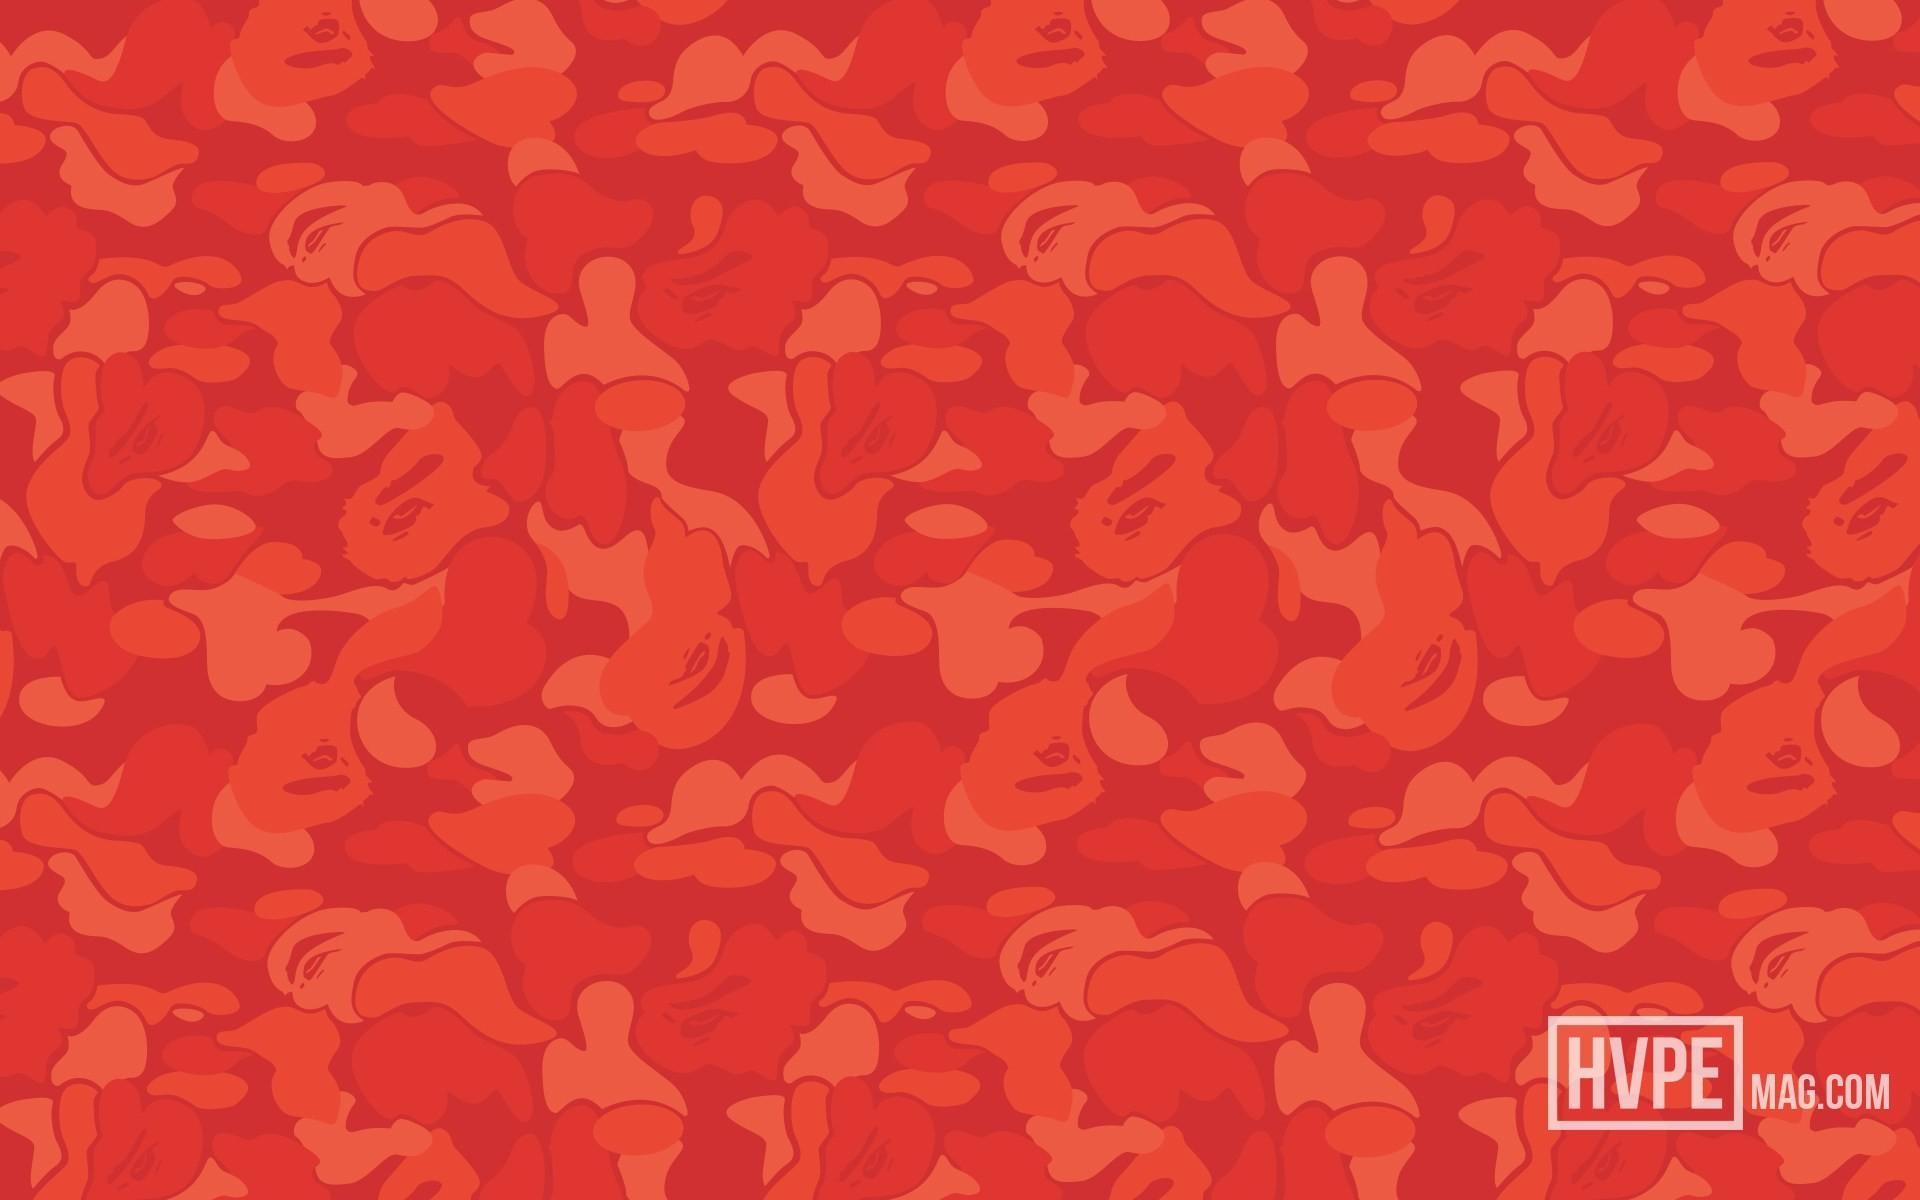 Bape Camo Wallpaper